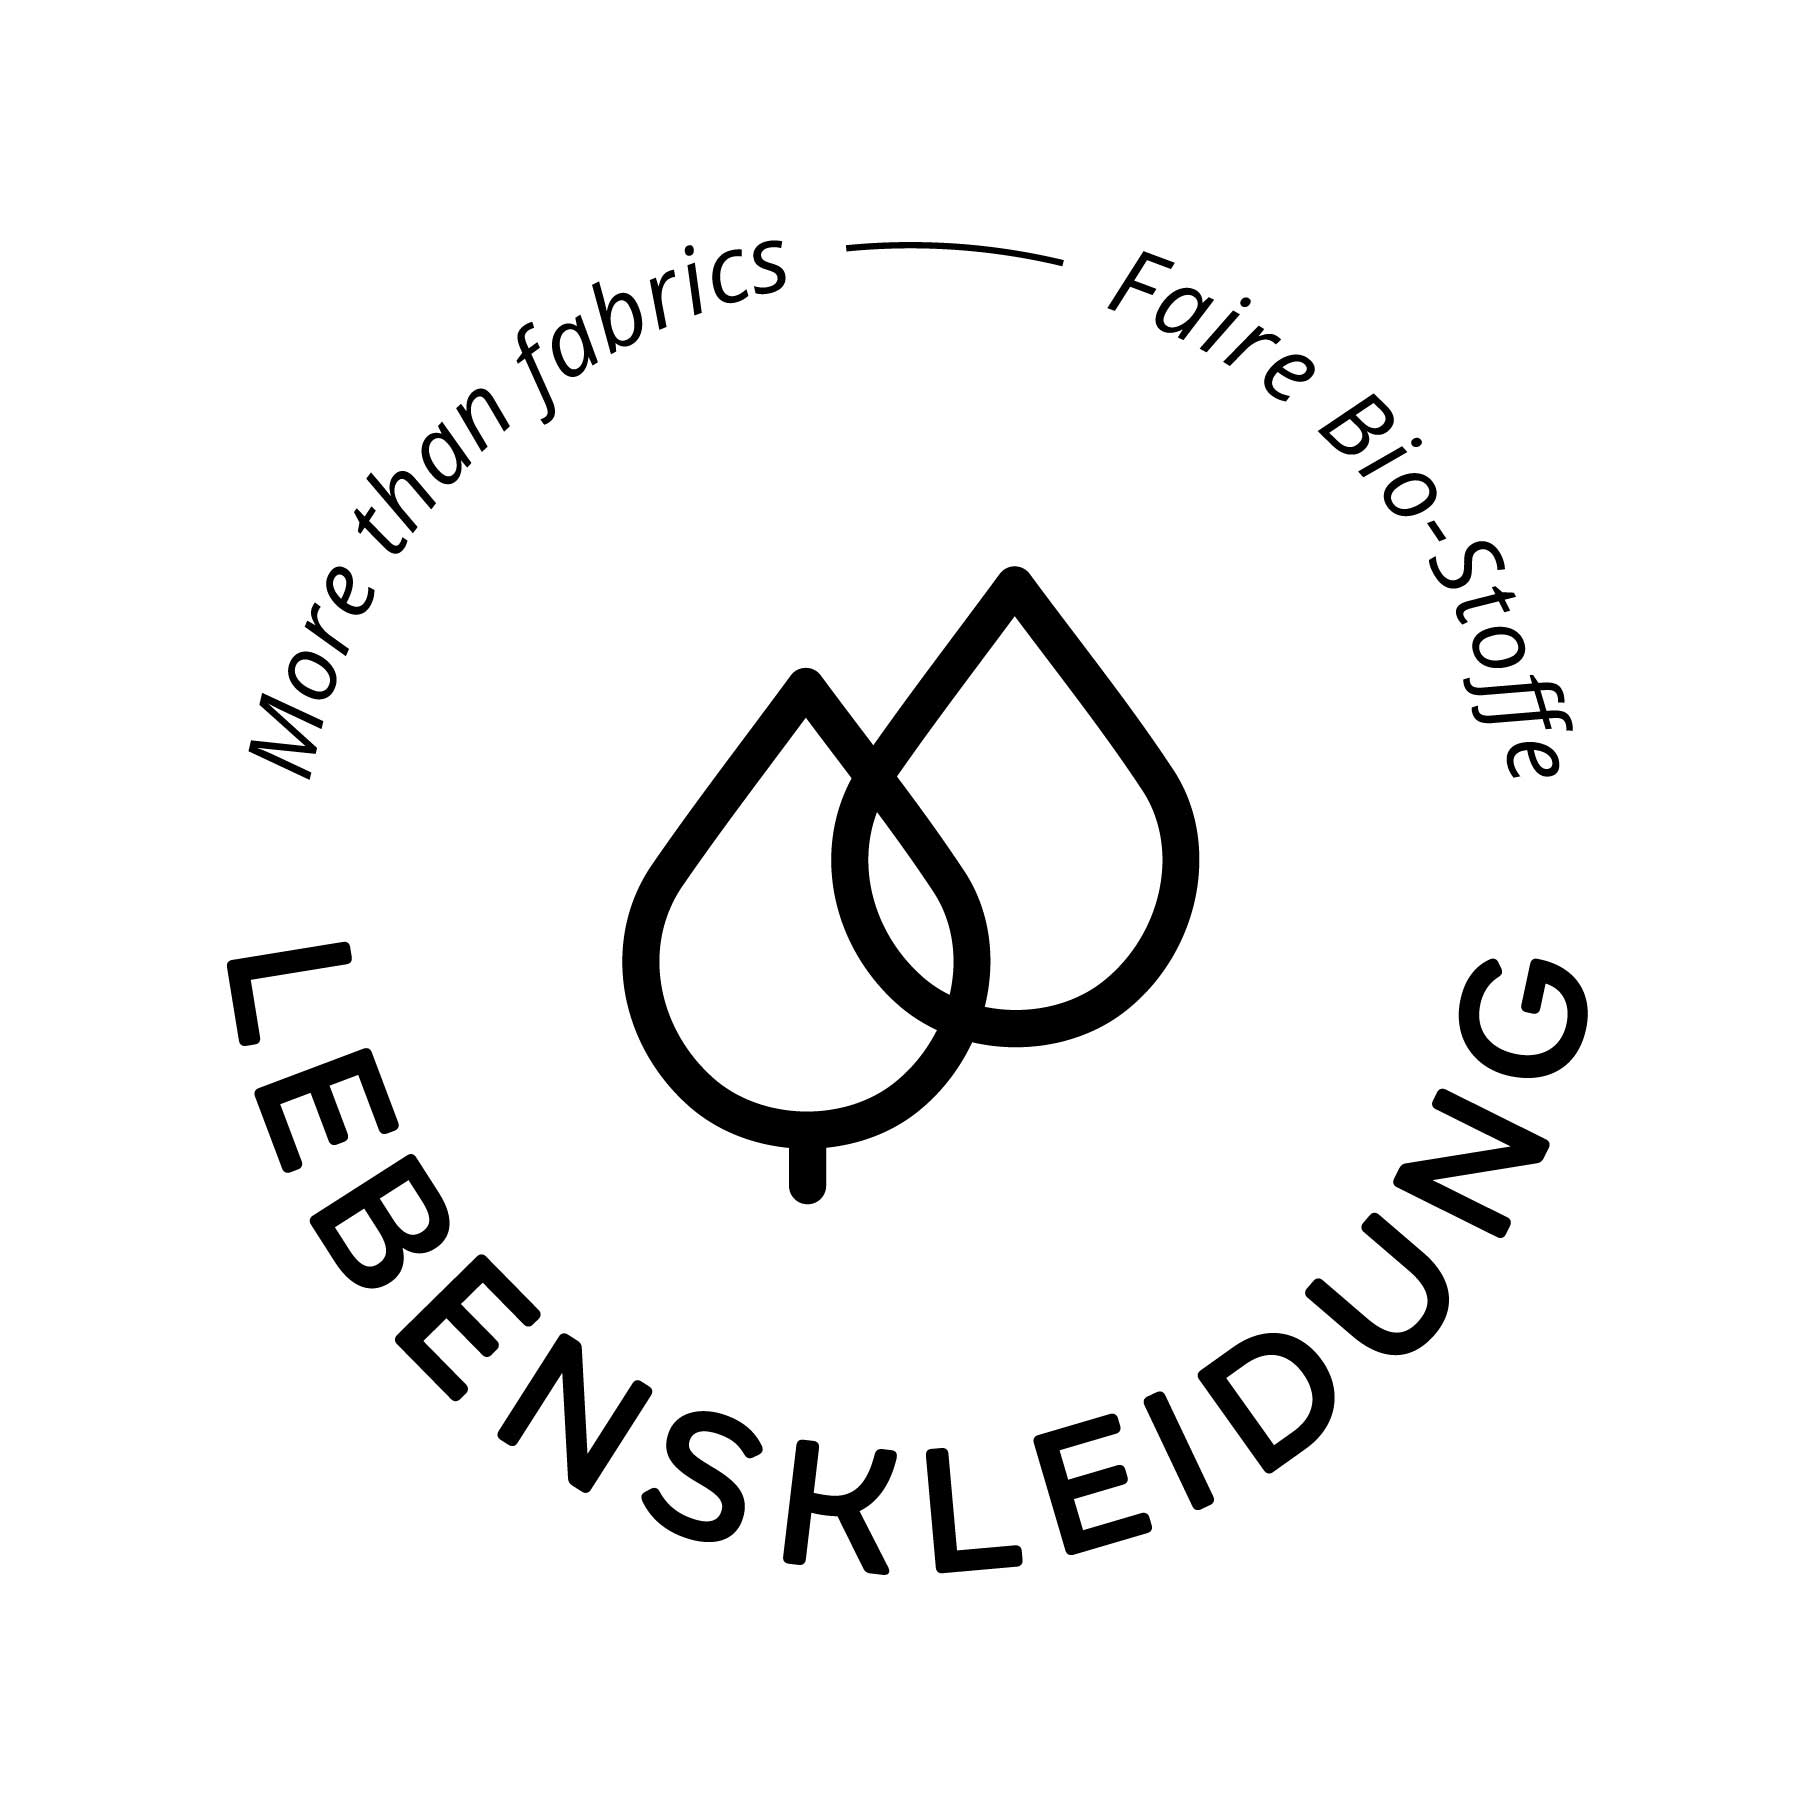 Tessuti organici Cordone di gomma - 40% cotone organico 60% gomma naturale -  adatto per tessuti leggeri e di peso medio - 2,2mm diámetro -  Ecru  - 100 Metros